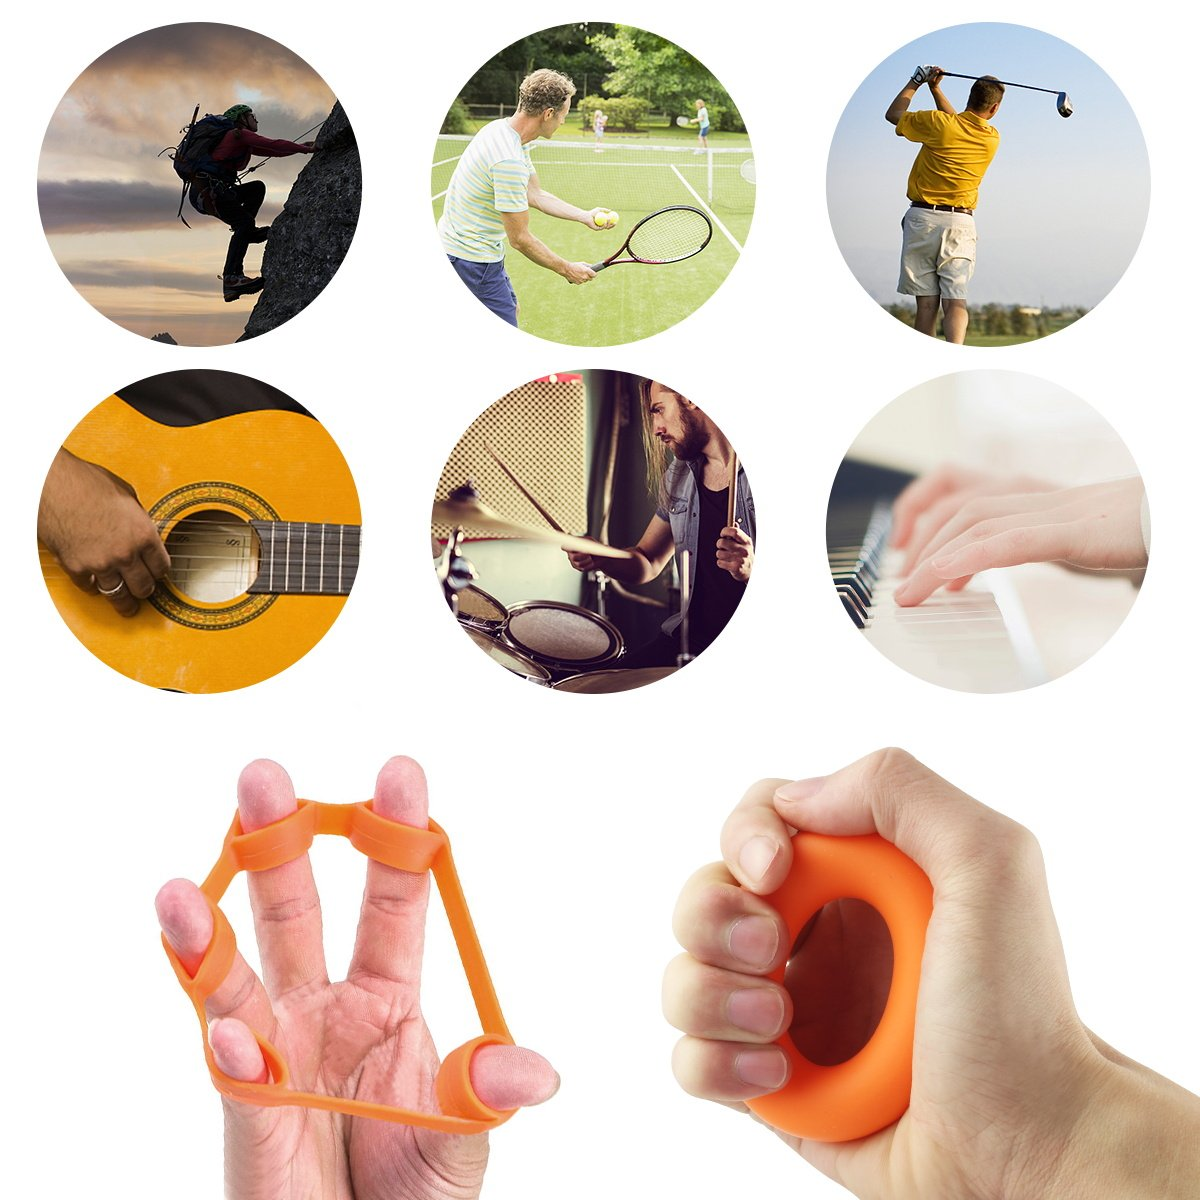 Vishusju Hand Grip Strengthener Finger Stretcher Strength Trainer Set